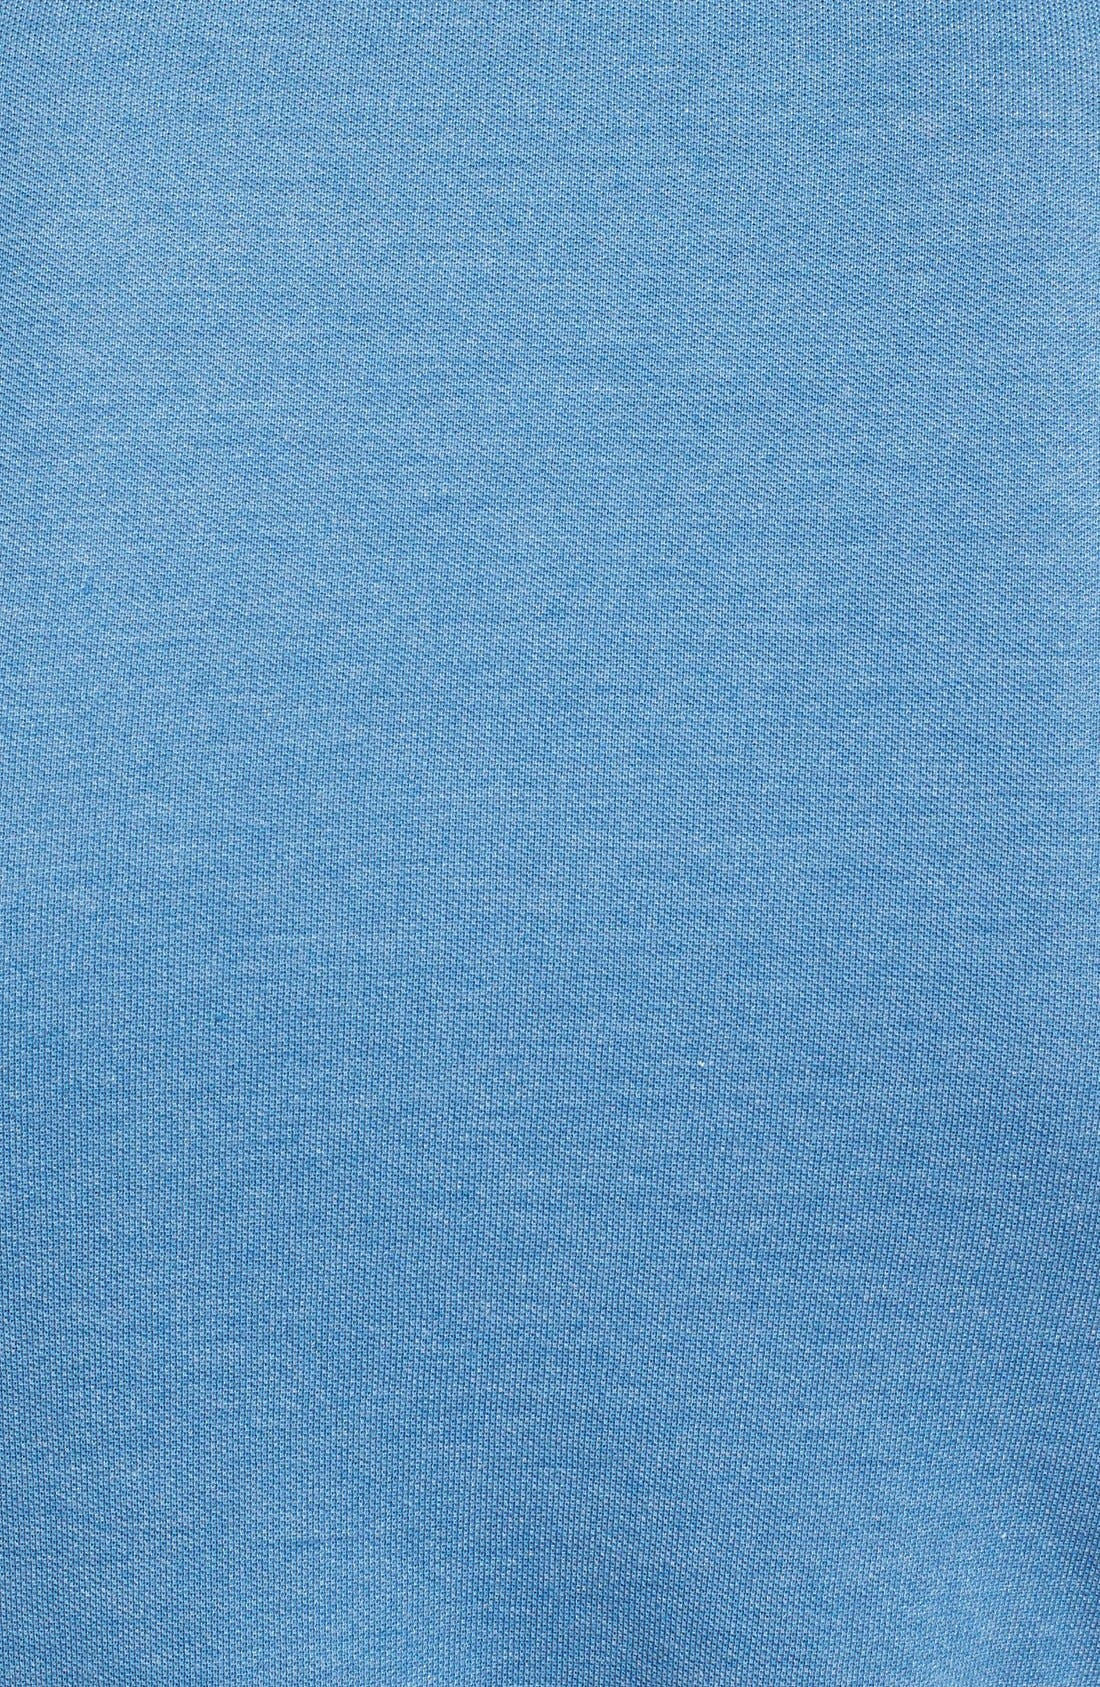 Alternate Image 3  - TOPMAN BLUE BARLOW POLO